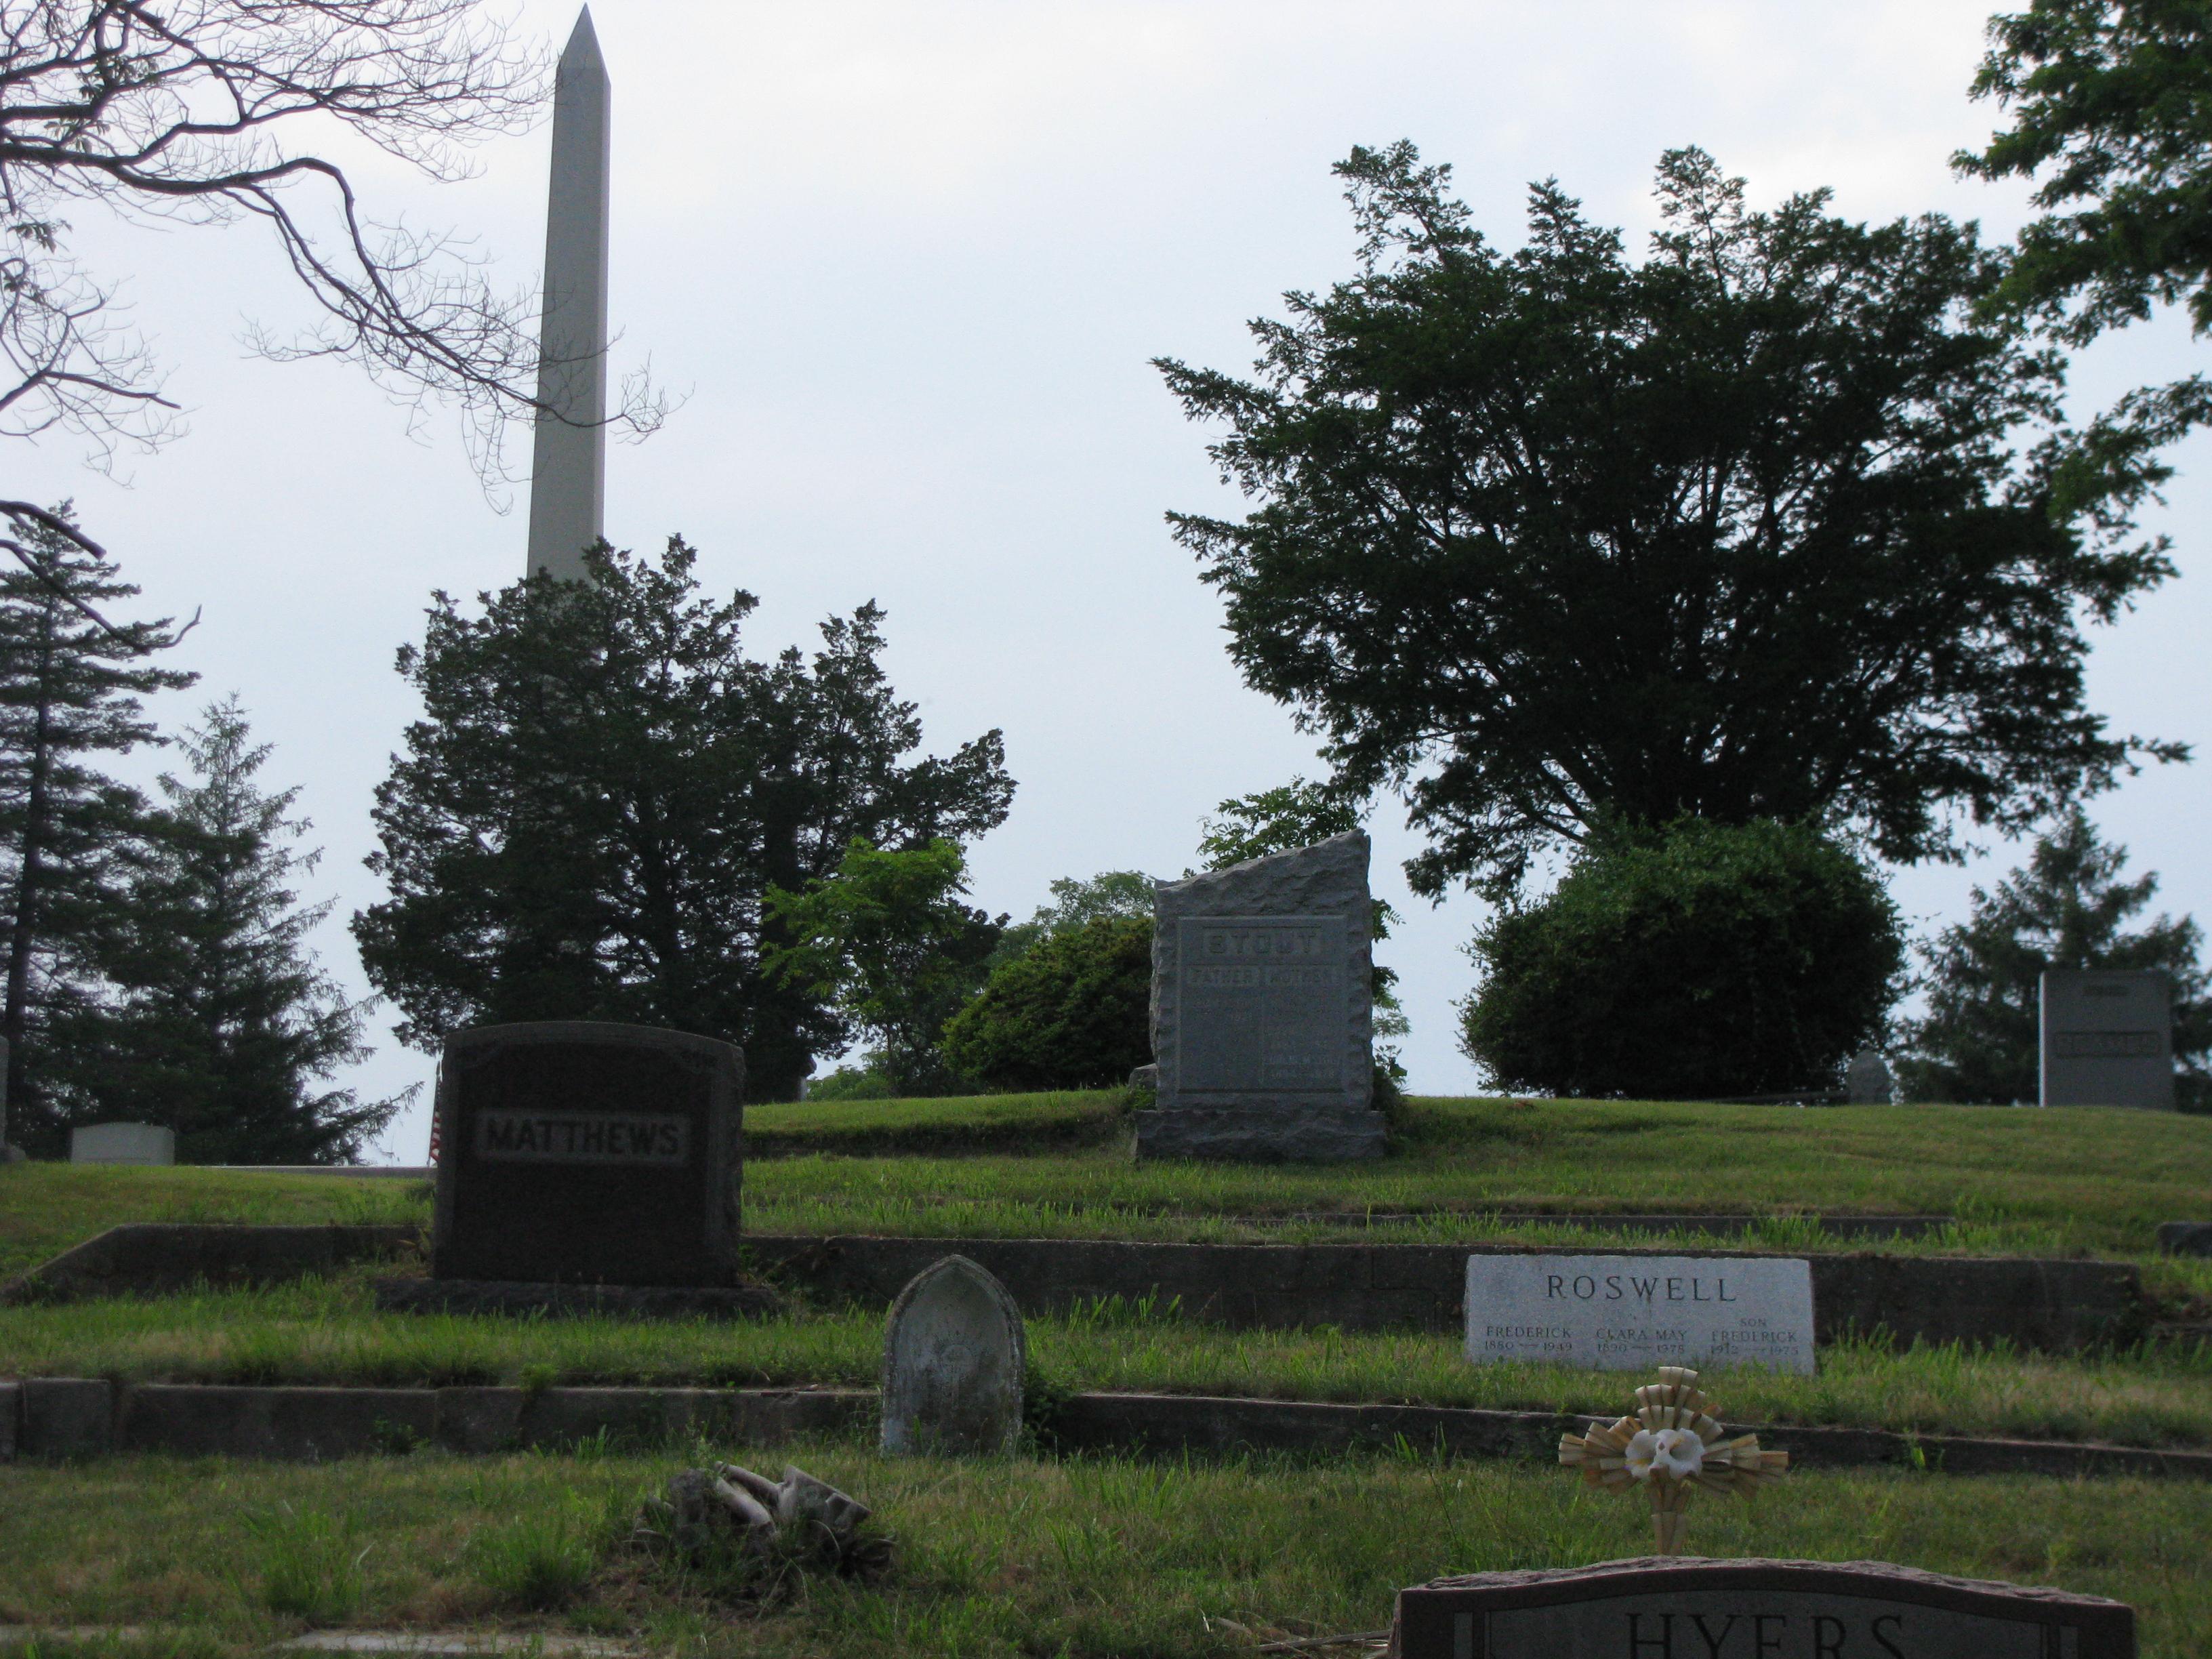 Mount Prospect Cemetery image 7